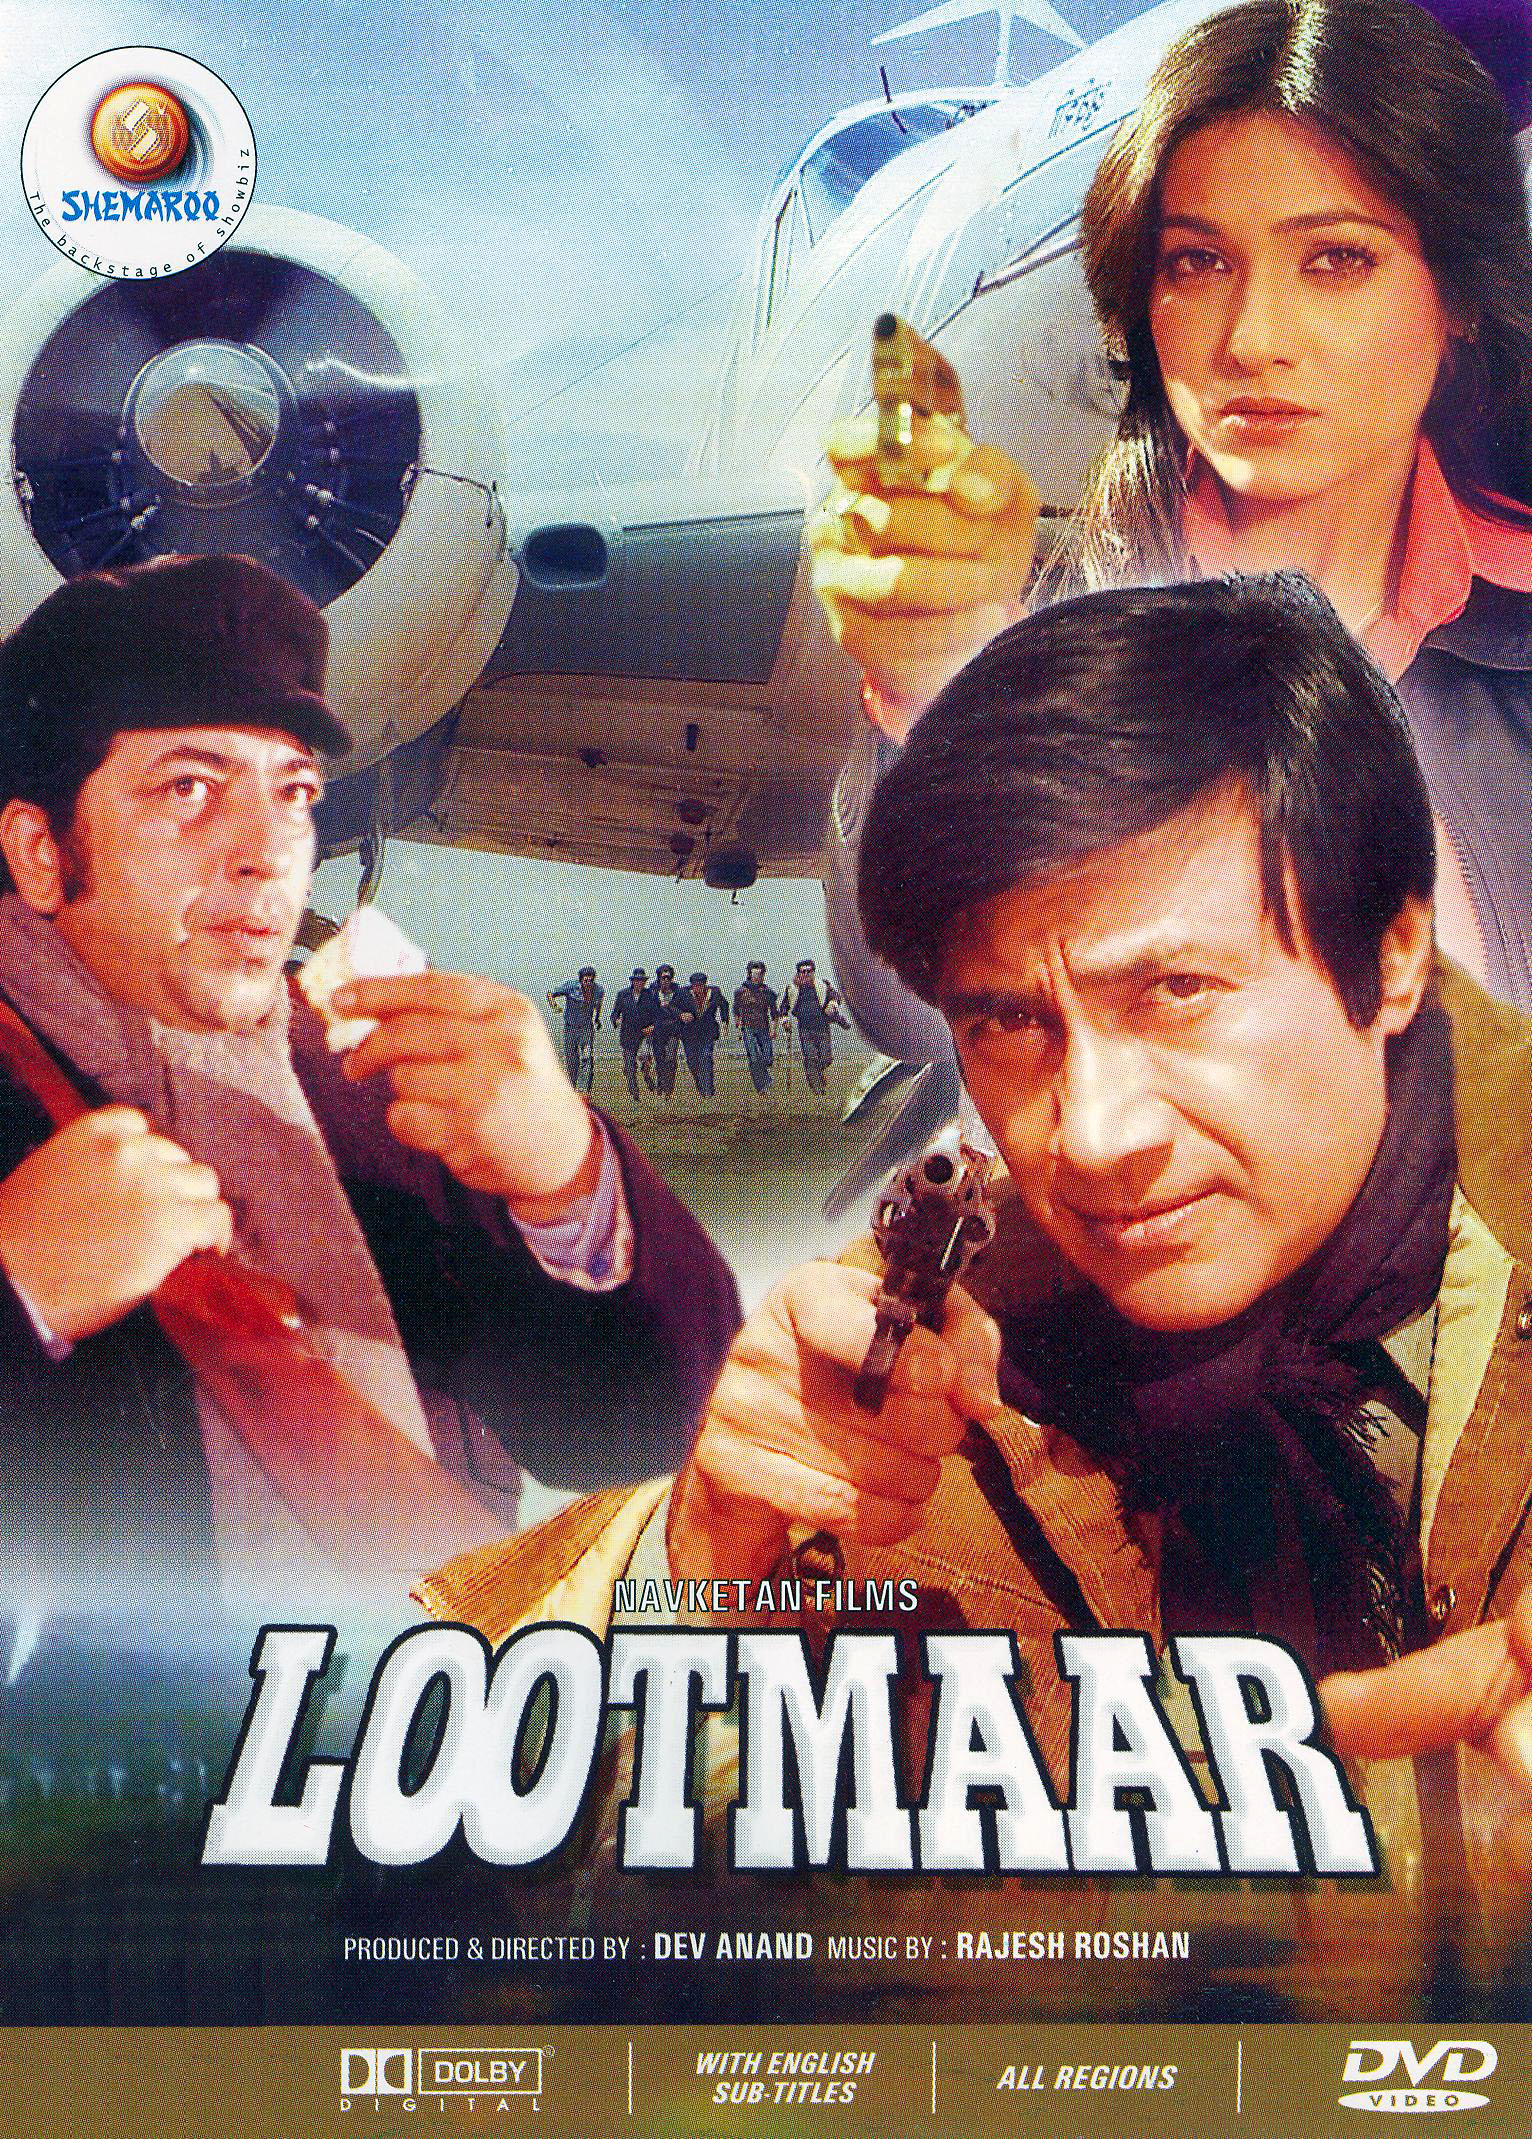 Yaariyan Hindi Movie Poster Lootmaar (1980) - Dev ...